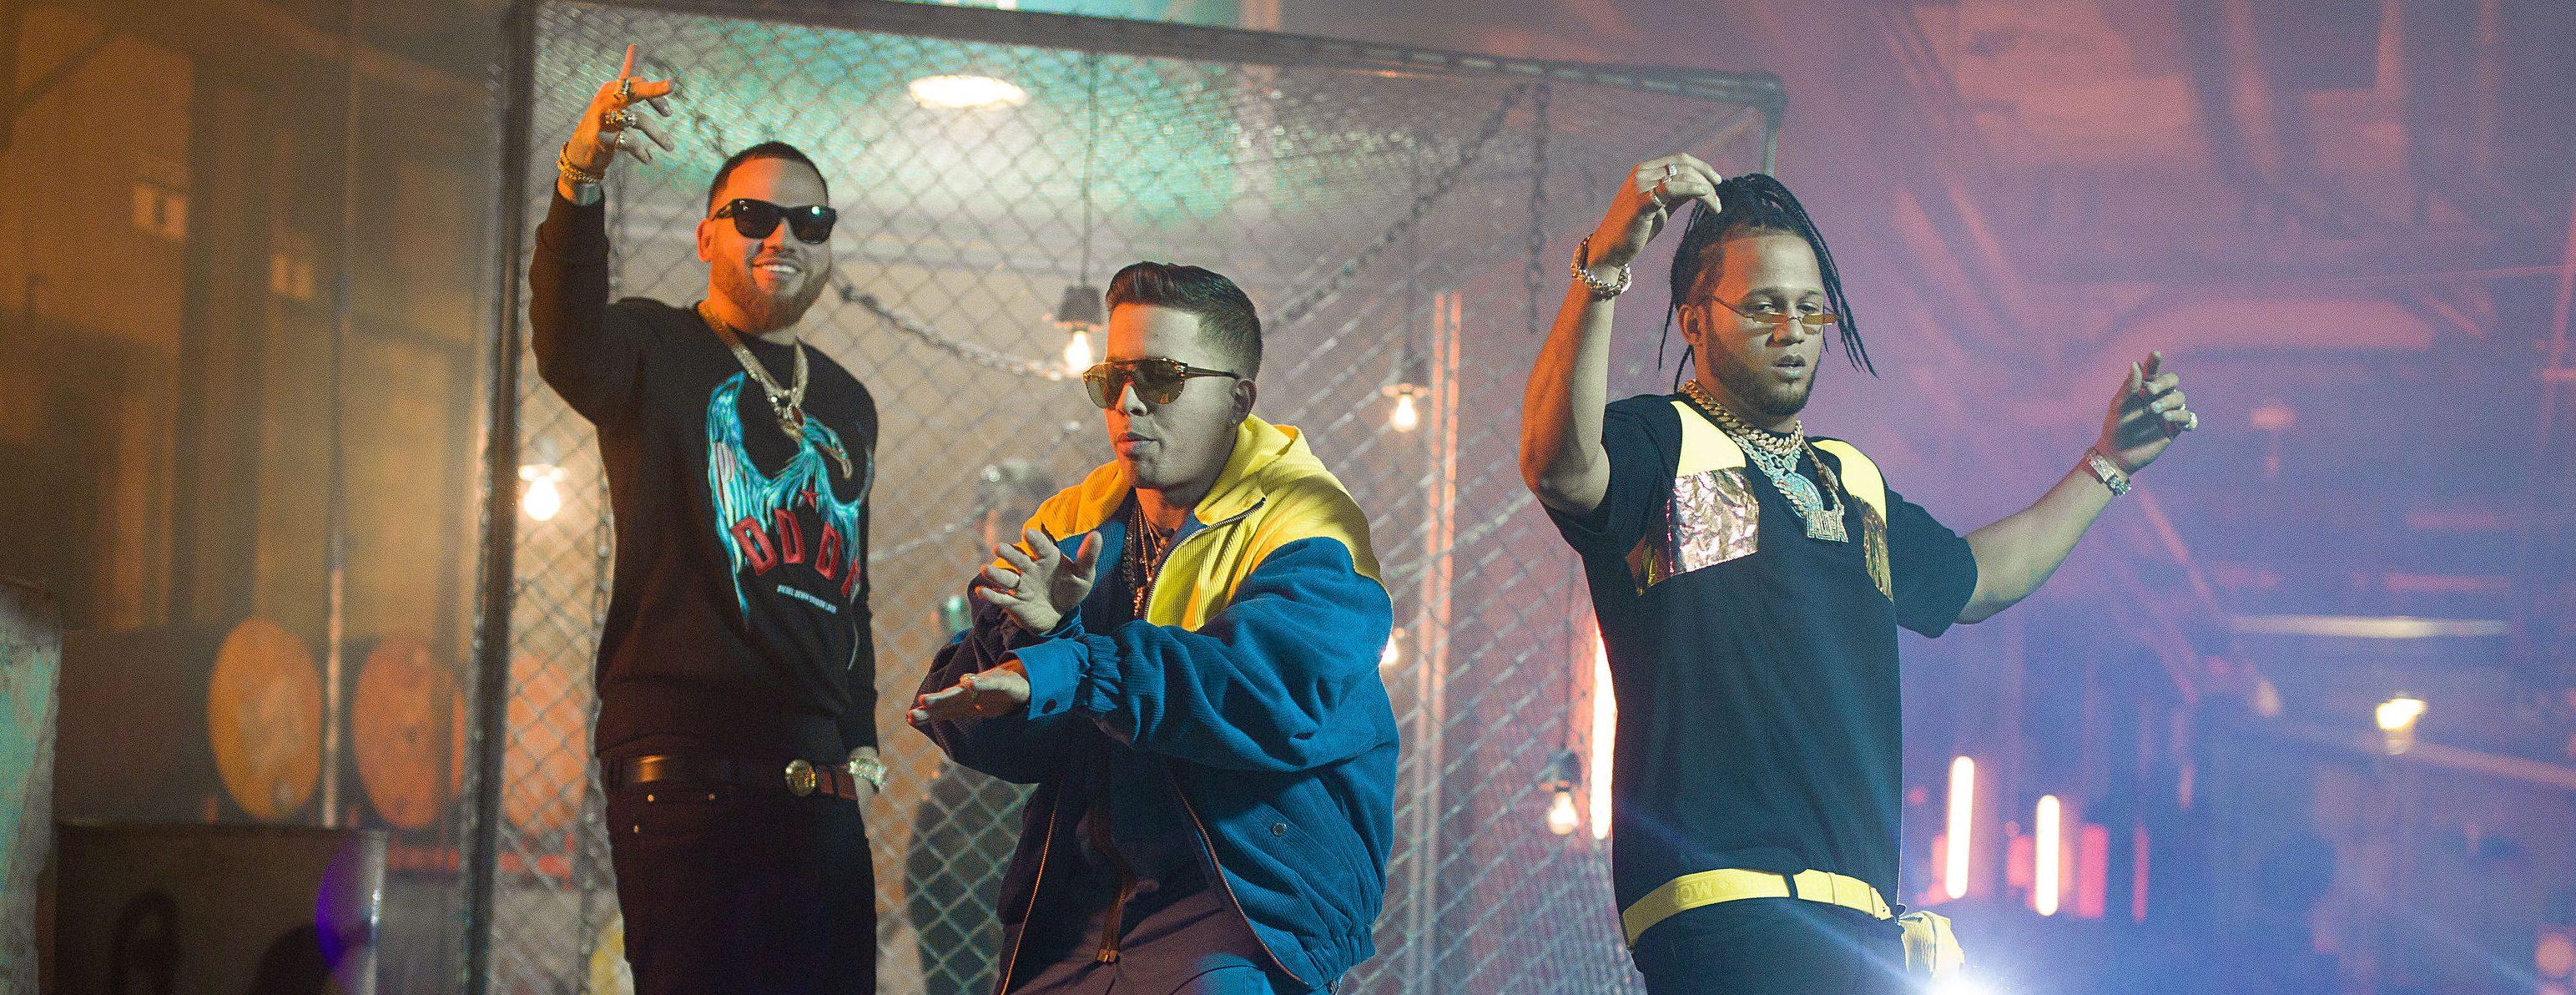 "De La Ghetto Teams Up WIth El Alfa & Miky Woodz For Trap Banger ""Feka"""